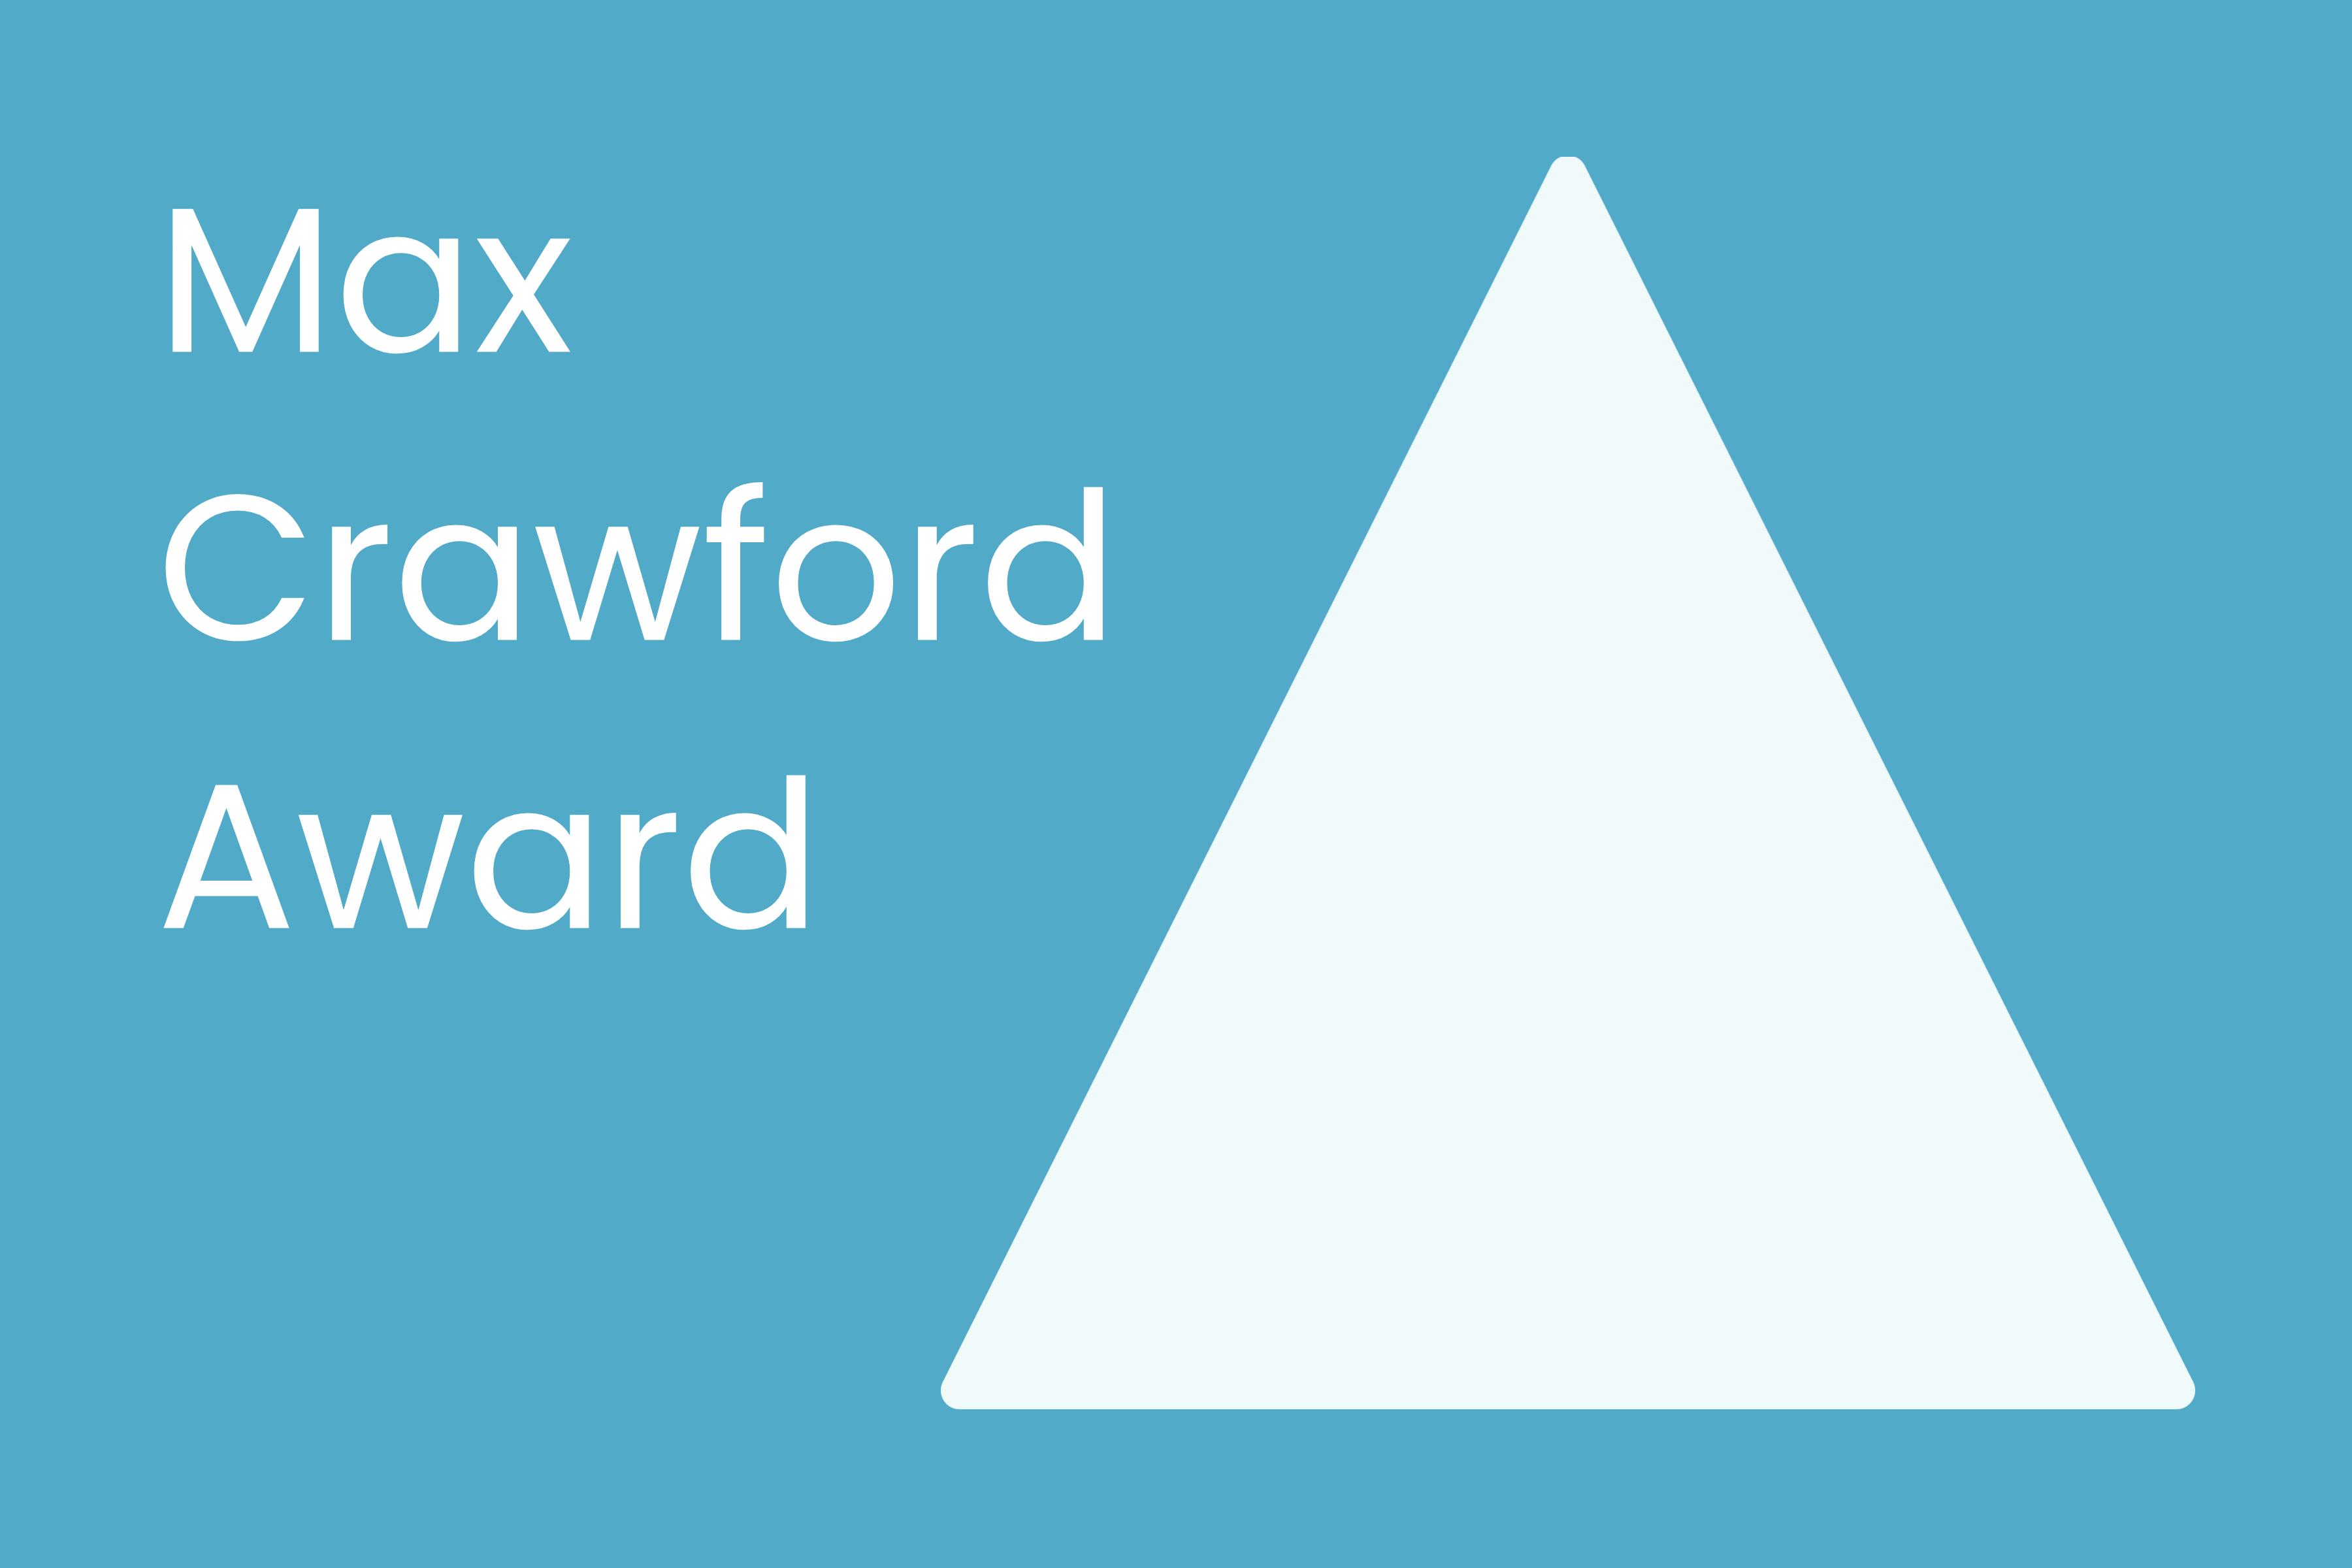 Max Crawford Award